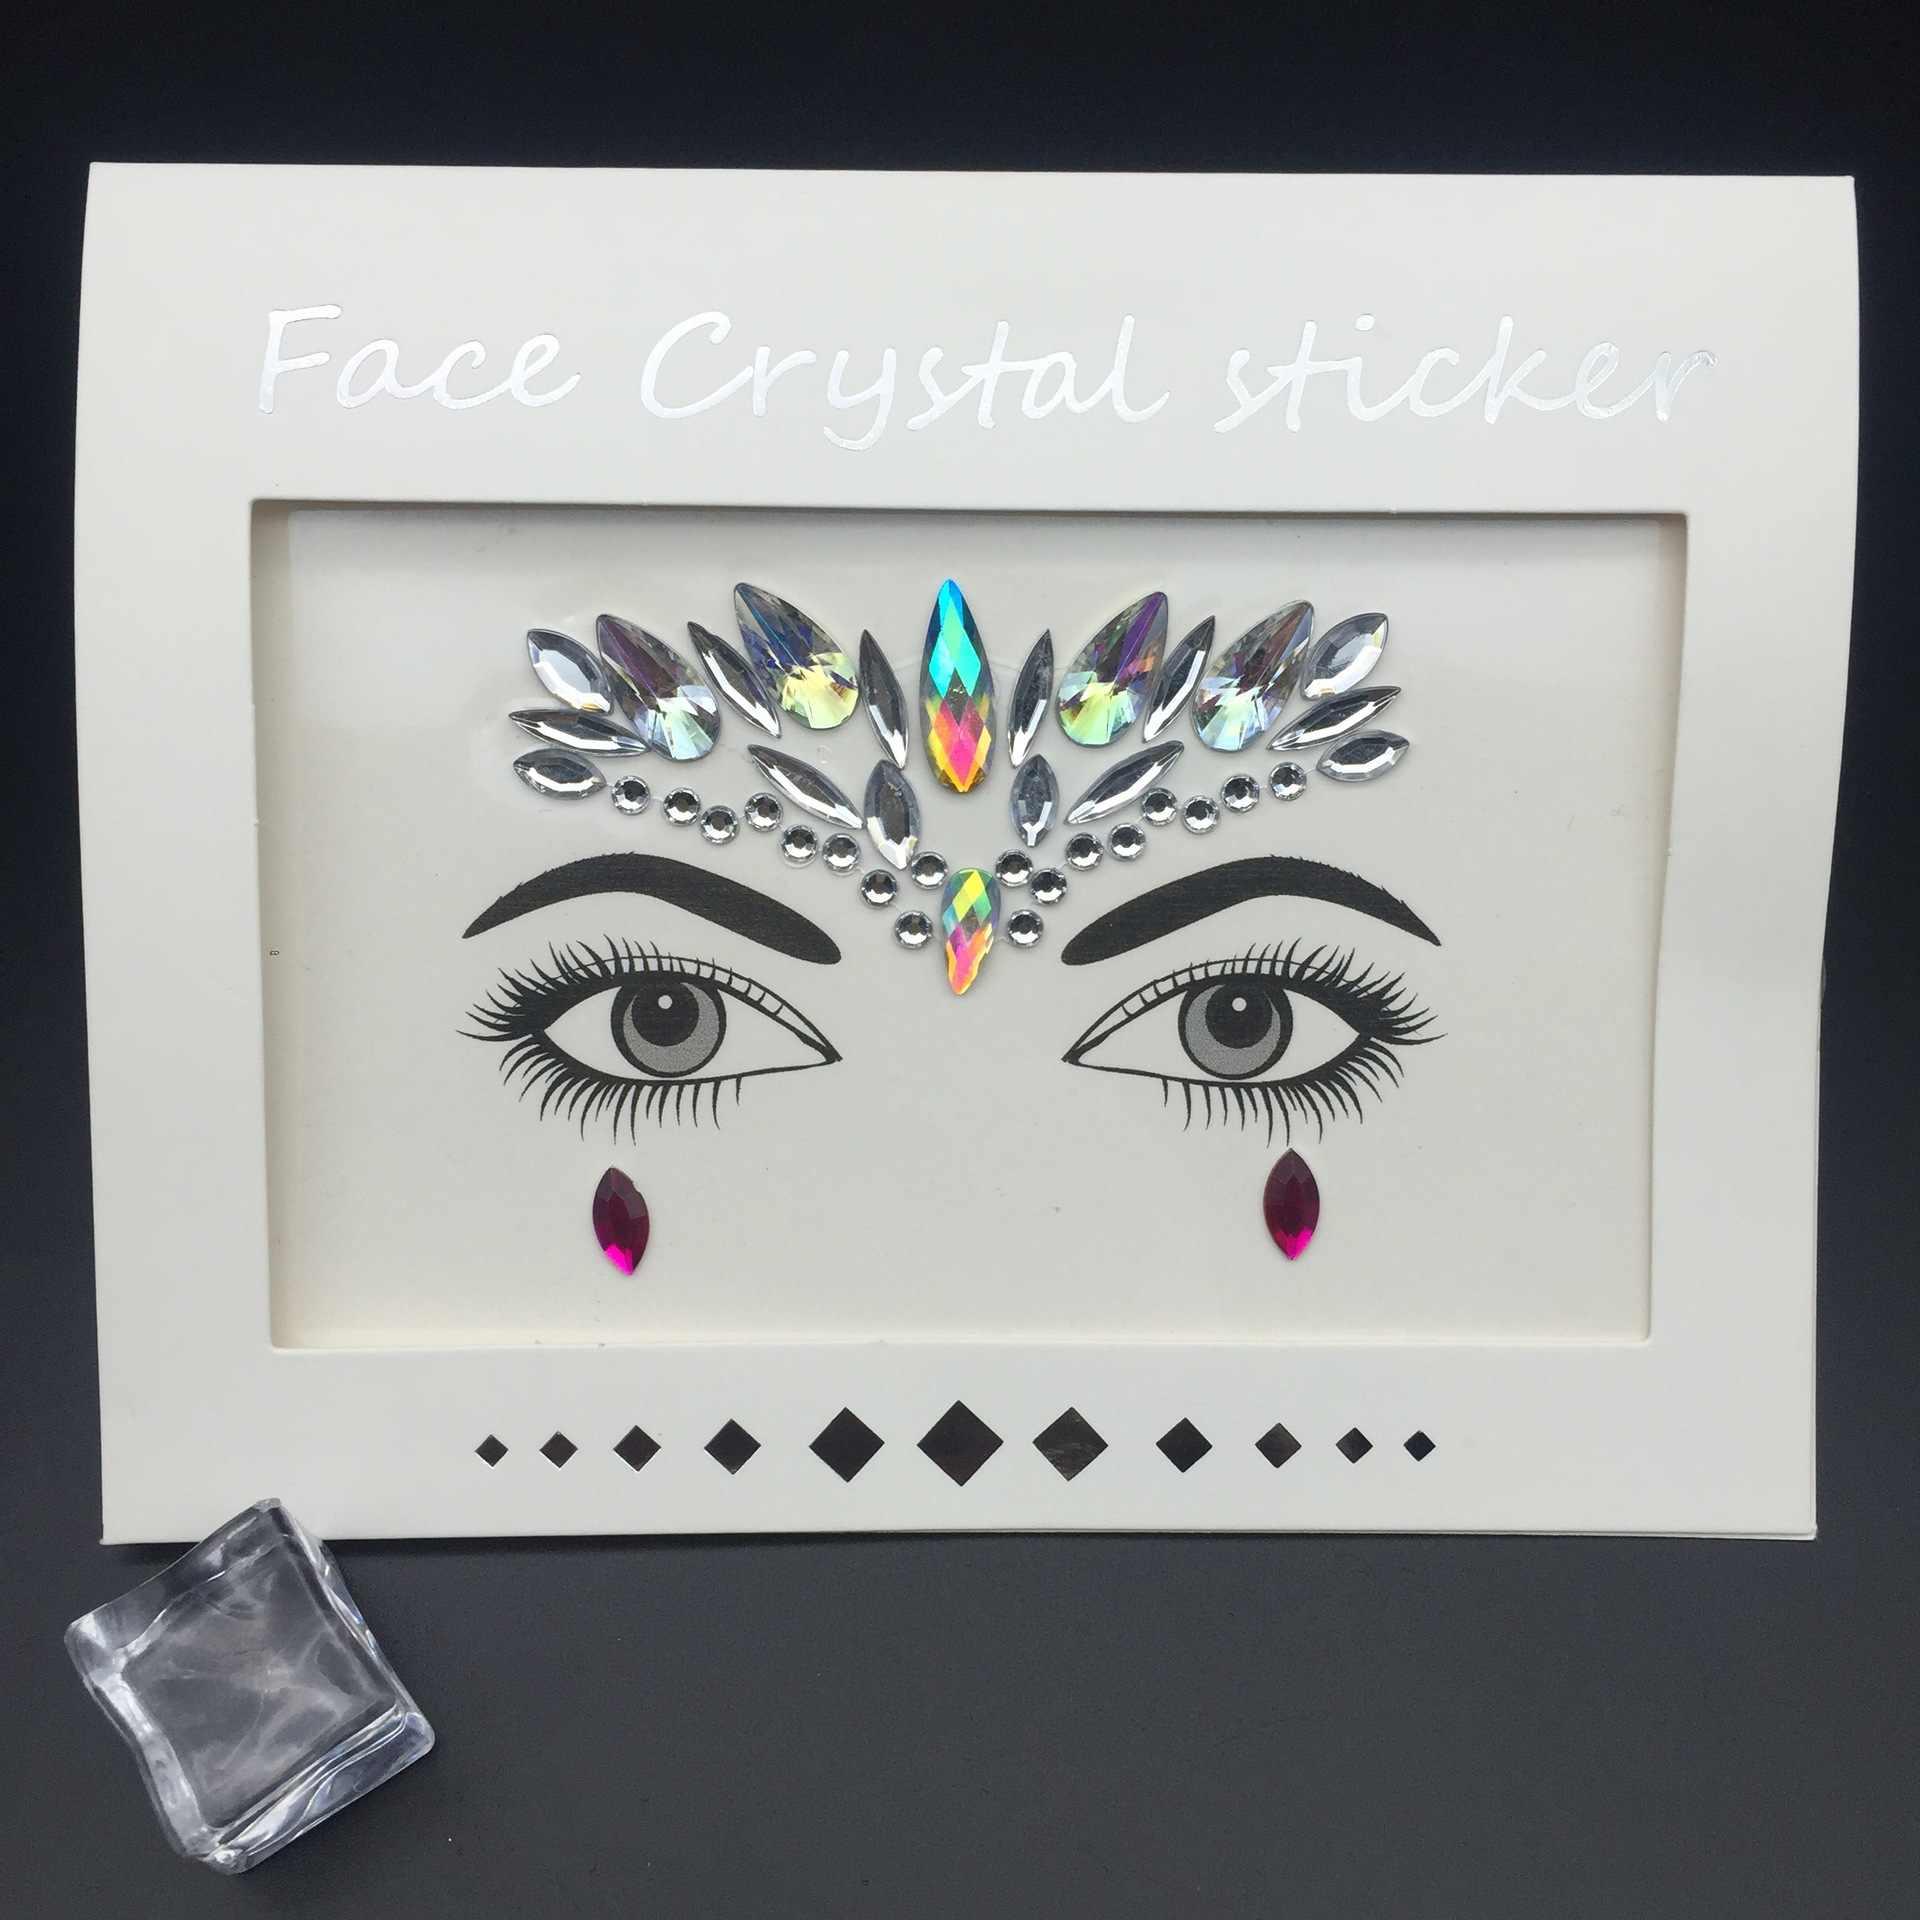 Cara de Mascarada decoración DIY joyería acrílica Diamante de imitación fiesta tatuaje temporal moda cara pegatinas para mujeres